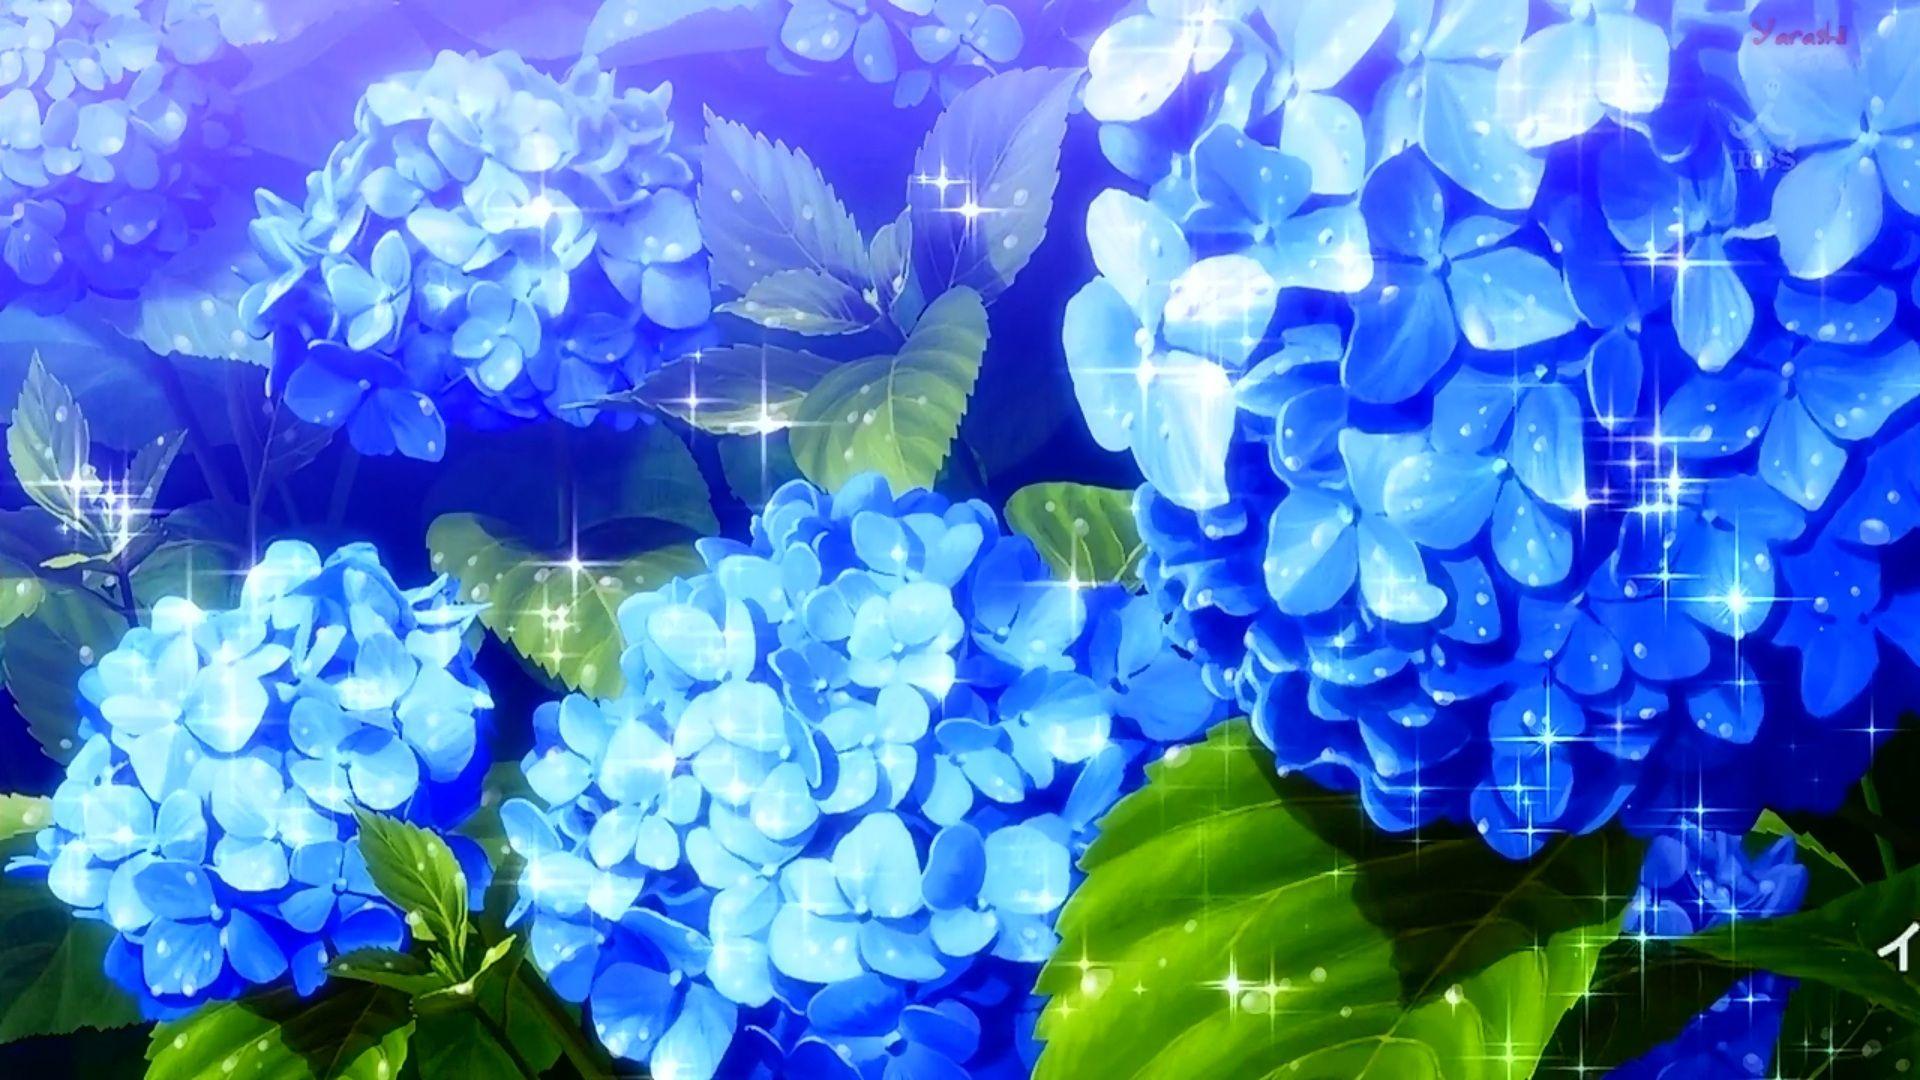 Anime Flower Scenery Wallpaper Desktop 56289 Wallpaper